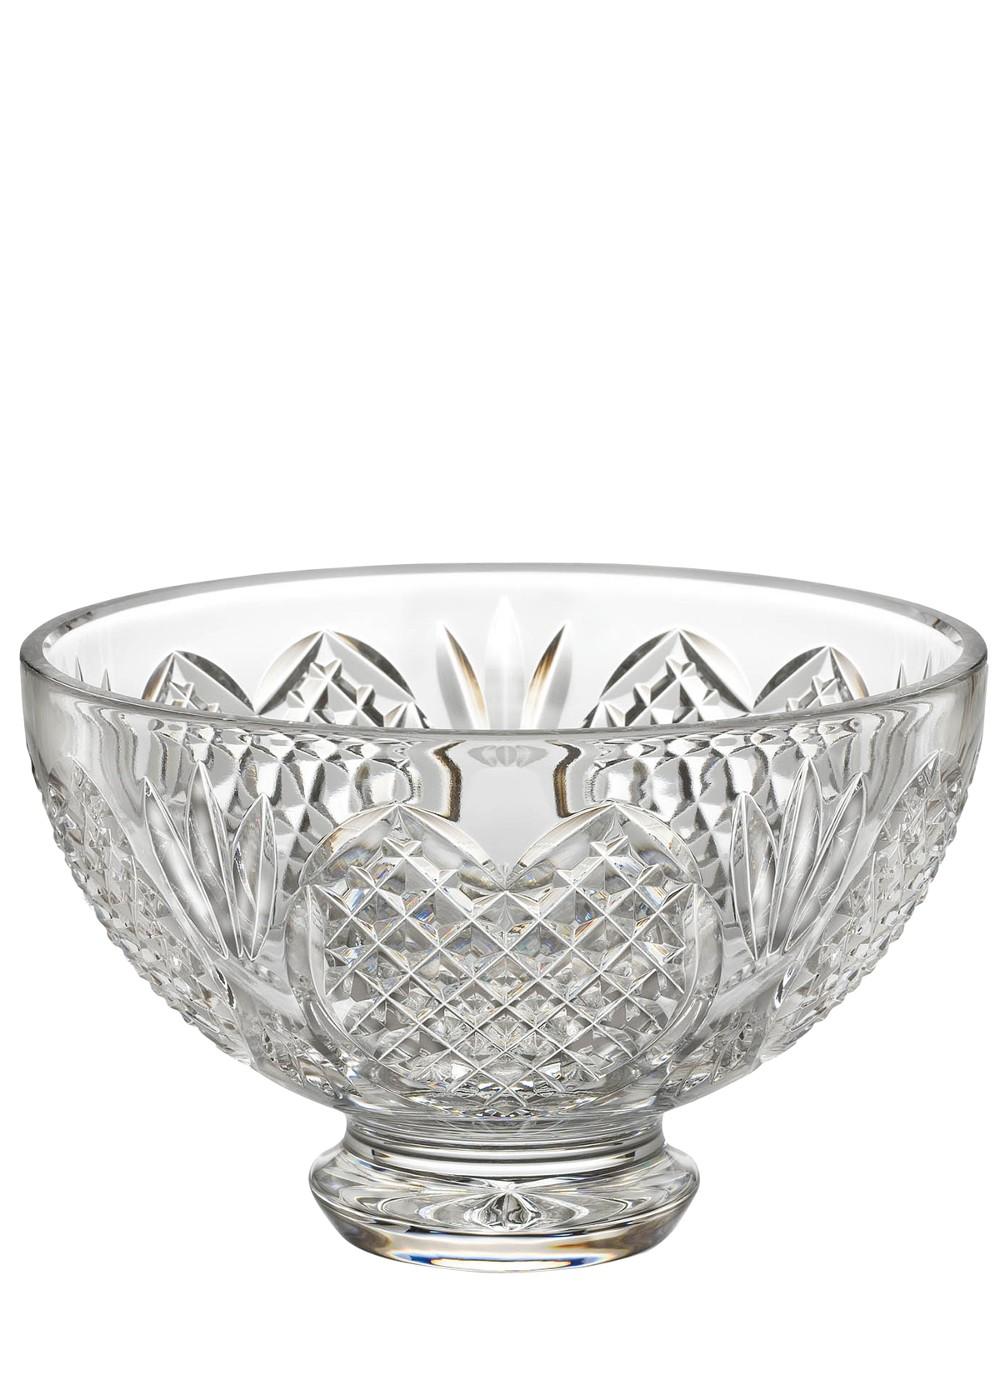 Waterford Crystal Vases - Crystal Vases and Bowls | Irish Crystal Vases